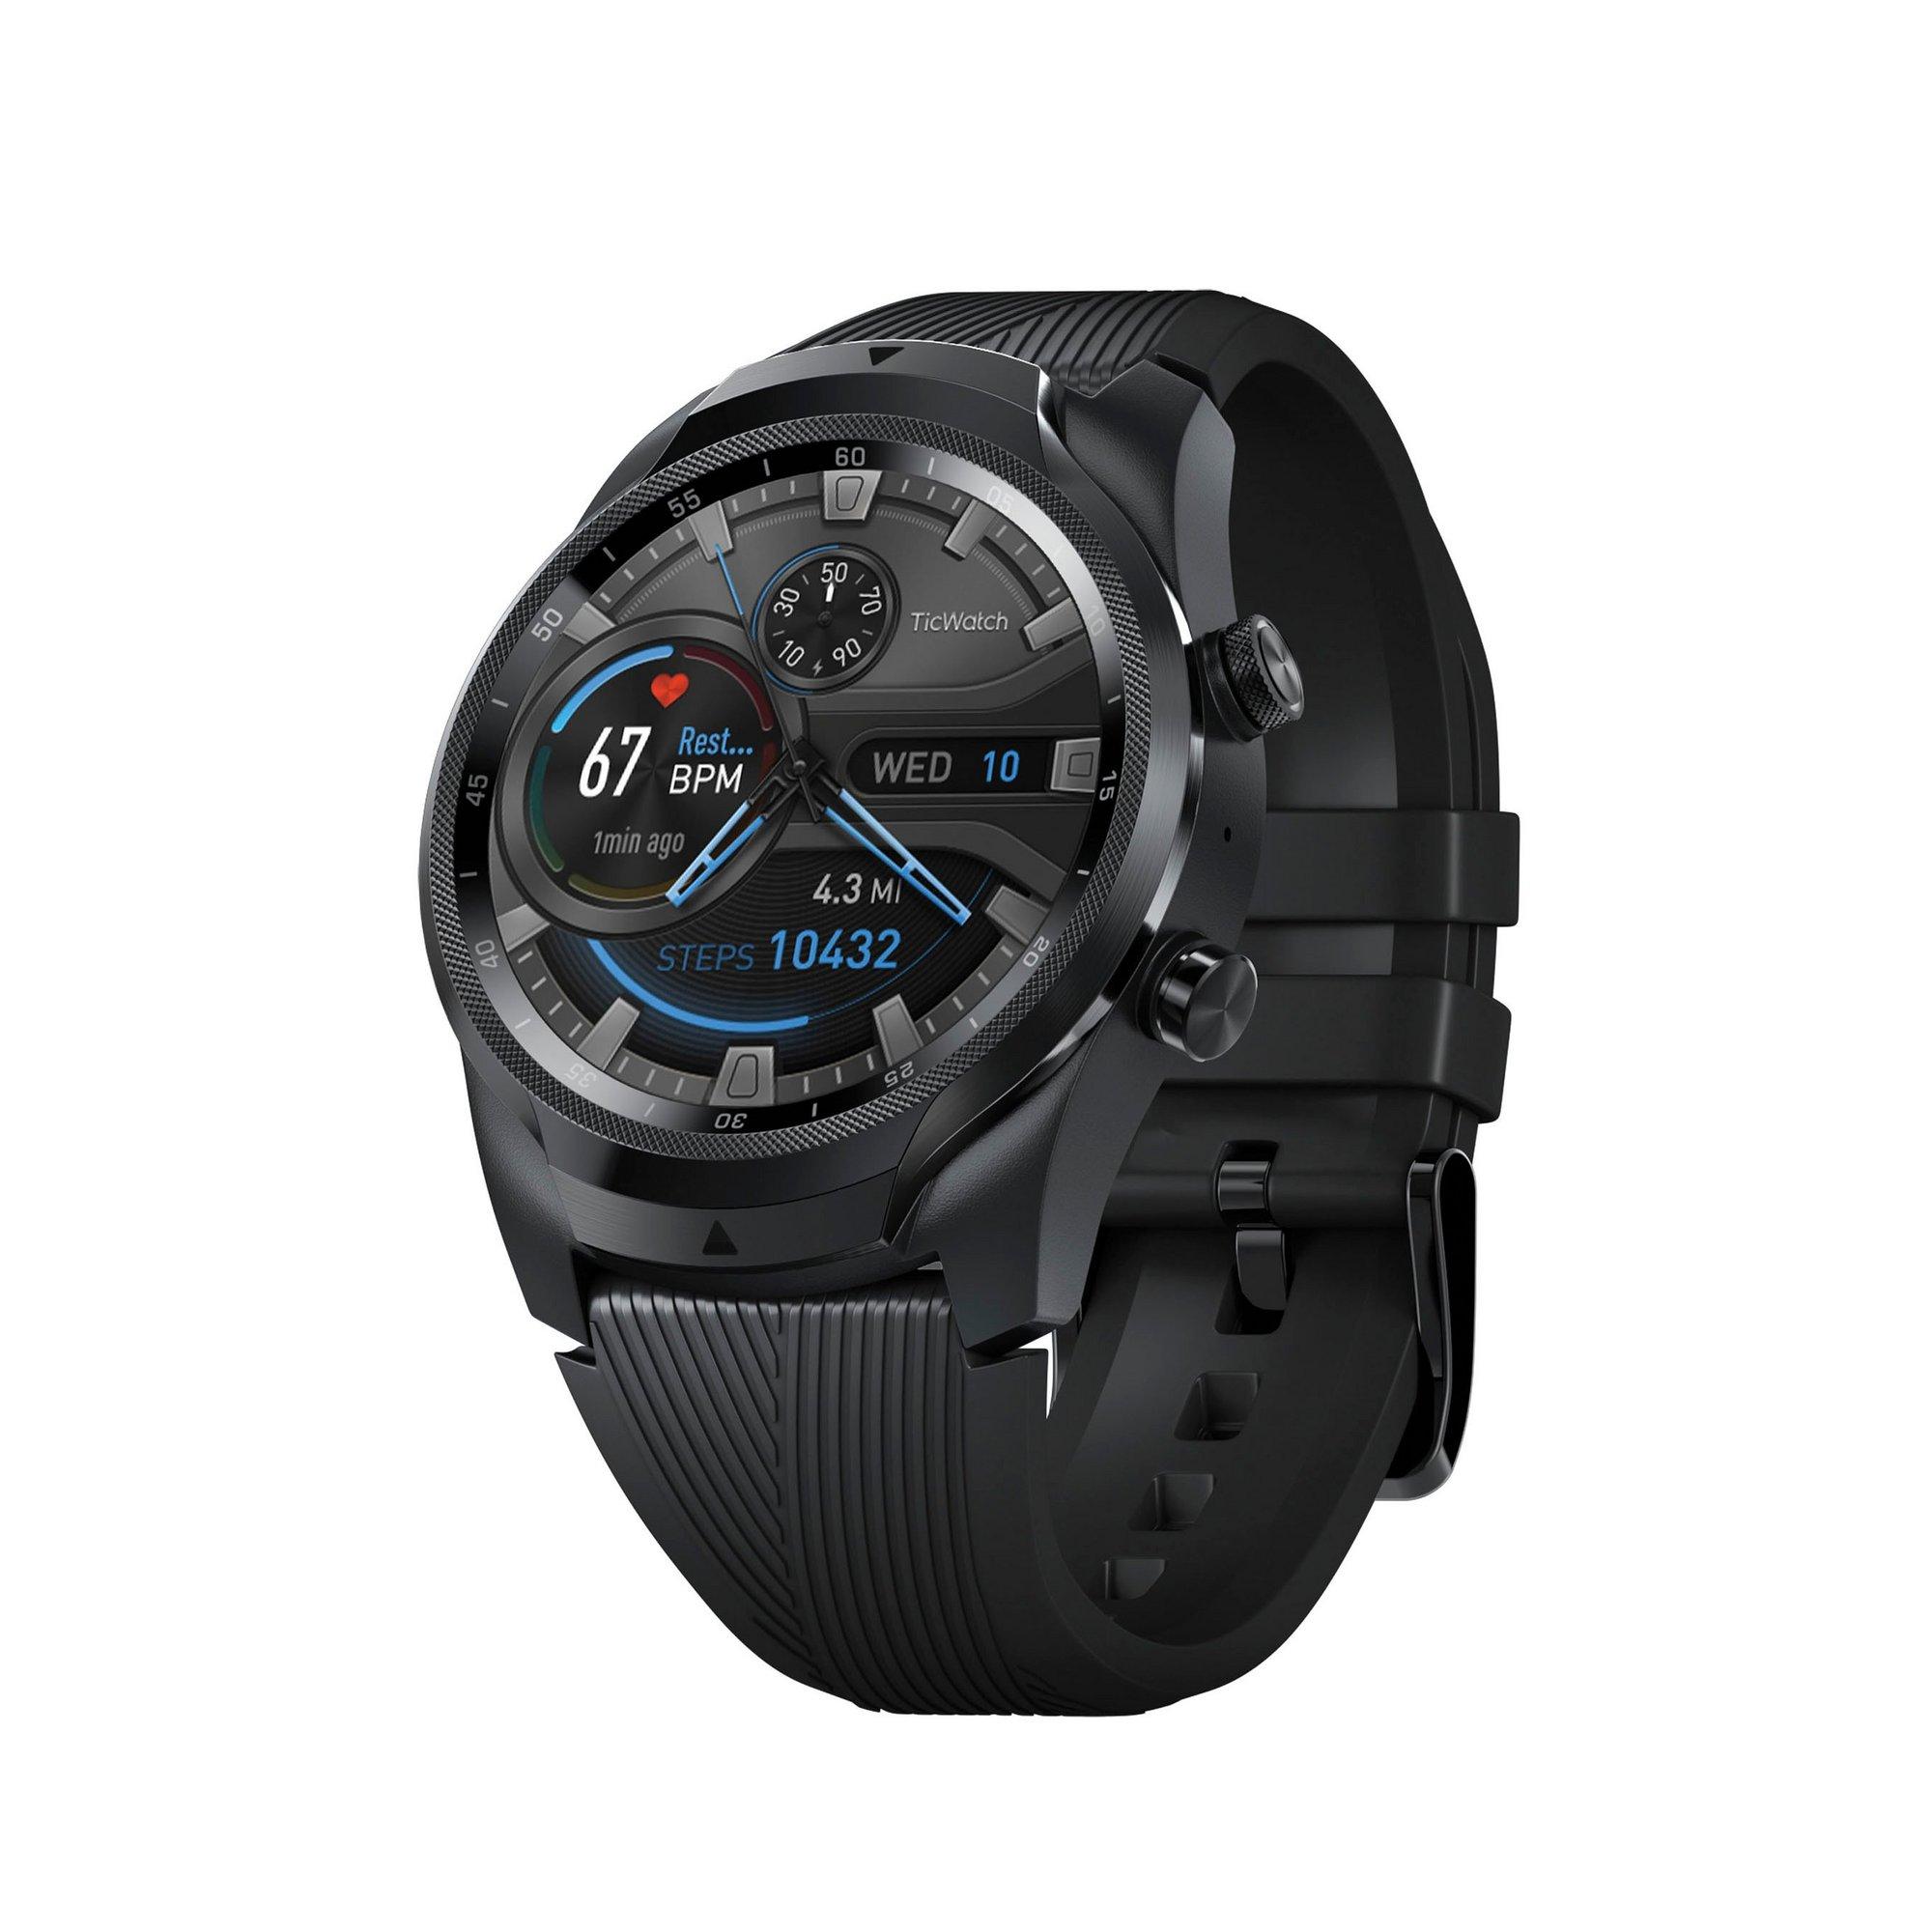 Image of TicWatch Pro 4G/LTE Smart Watch